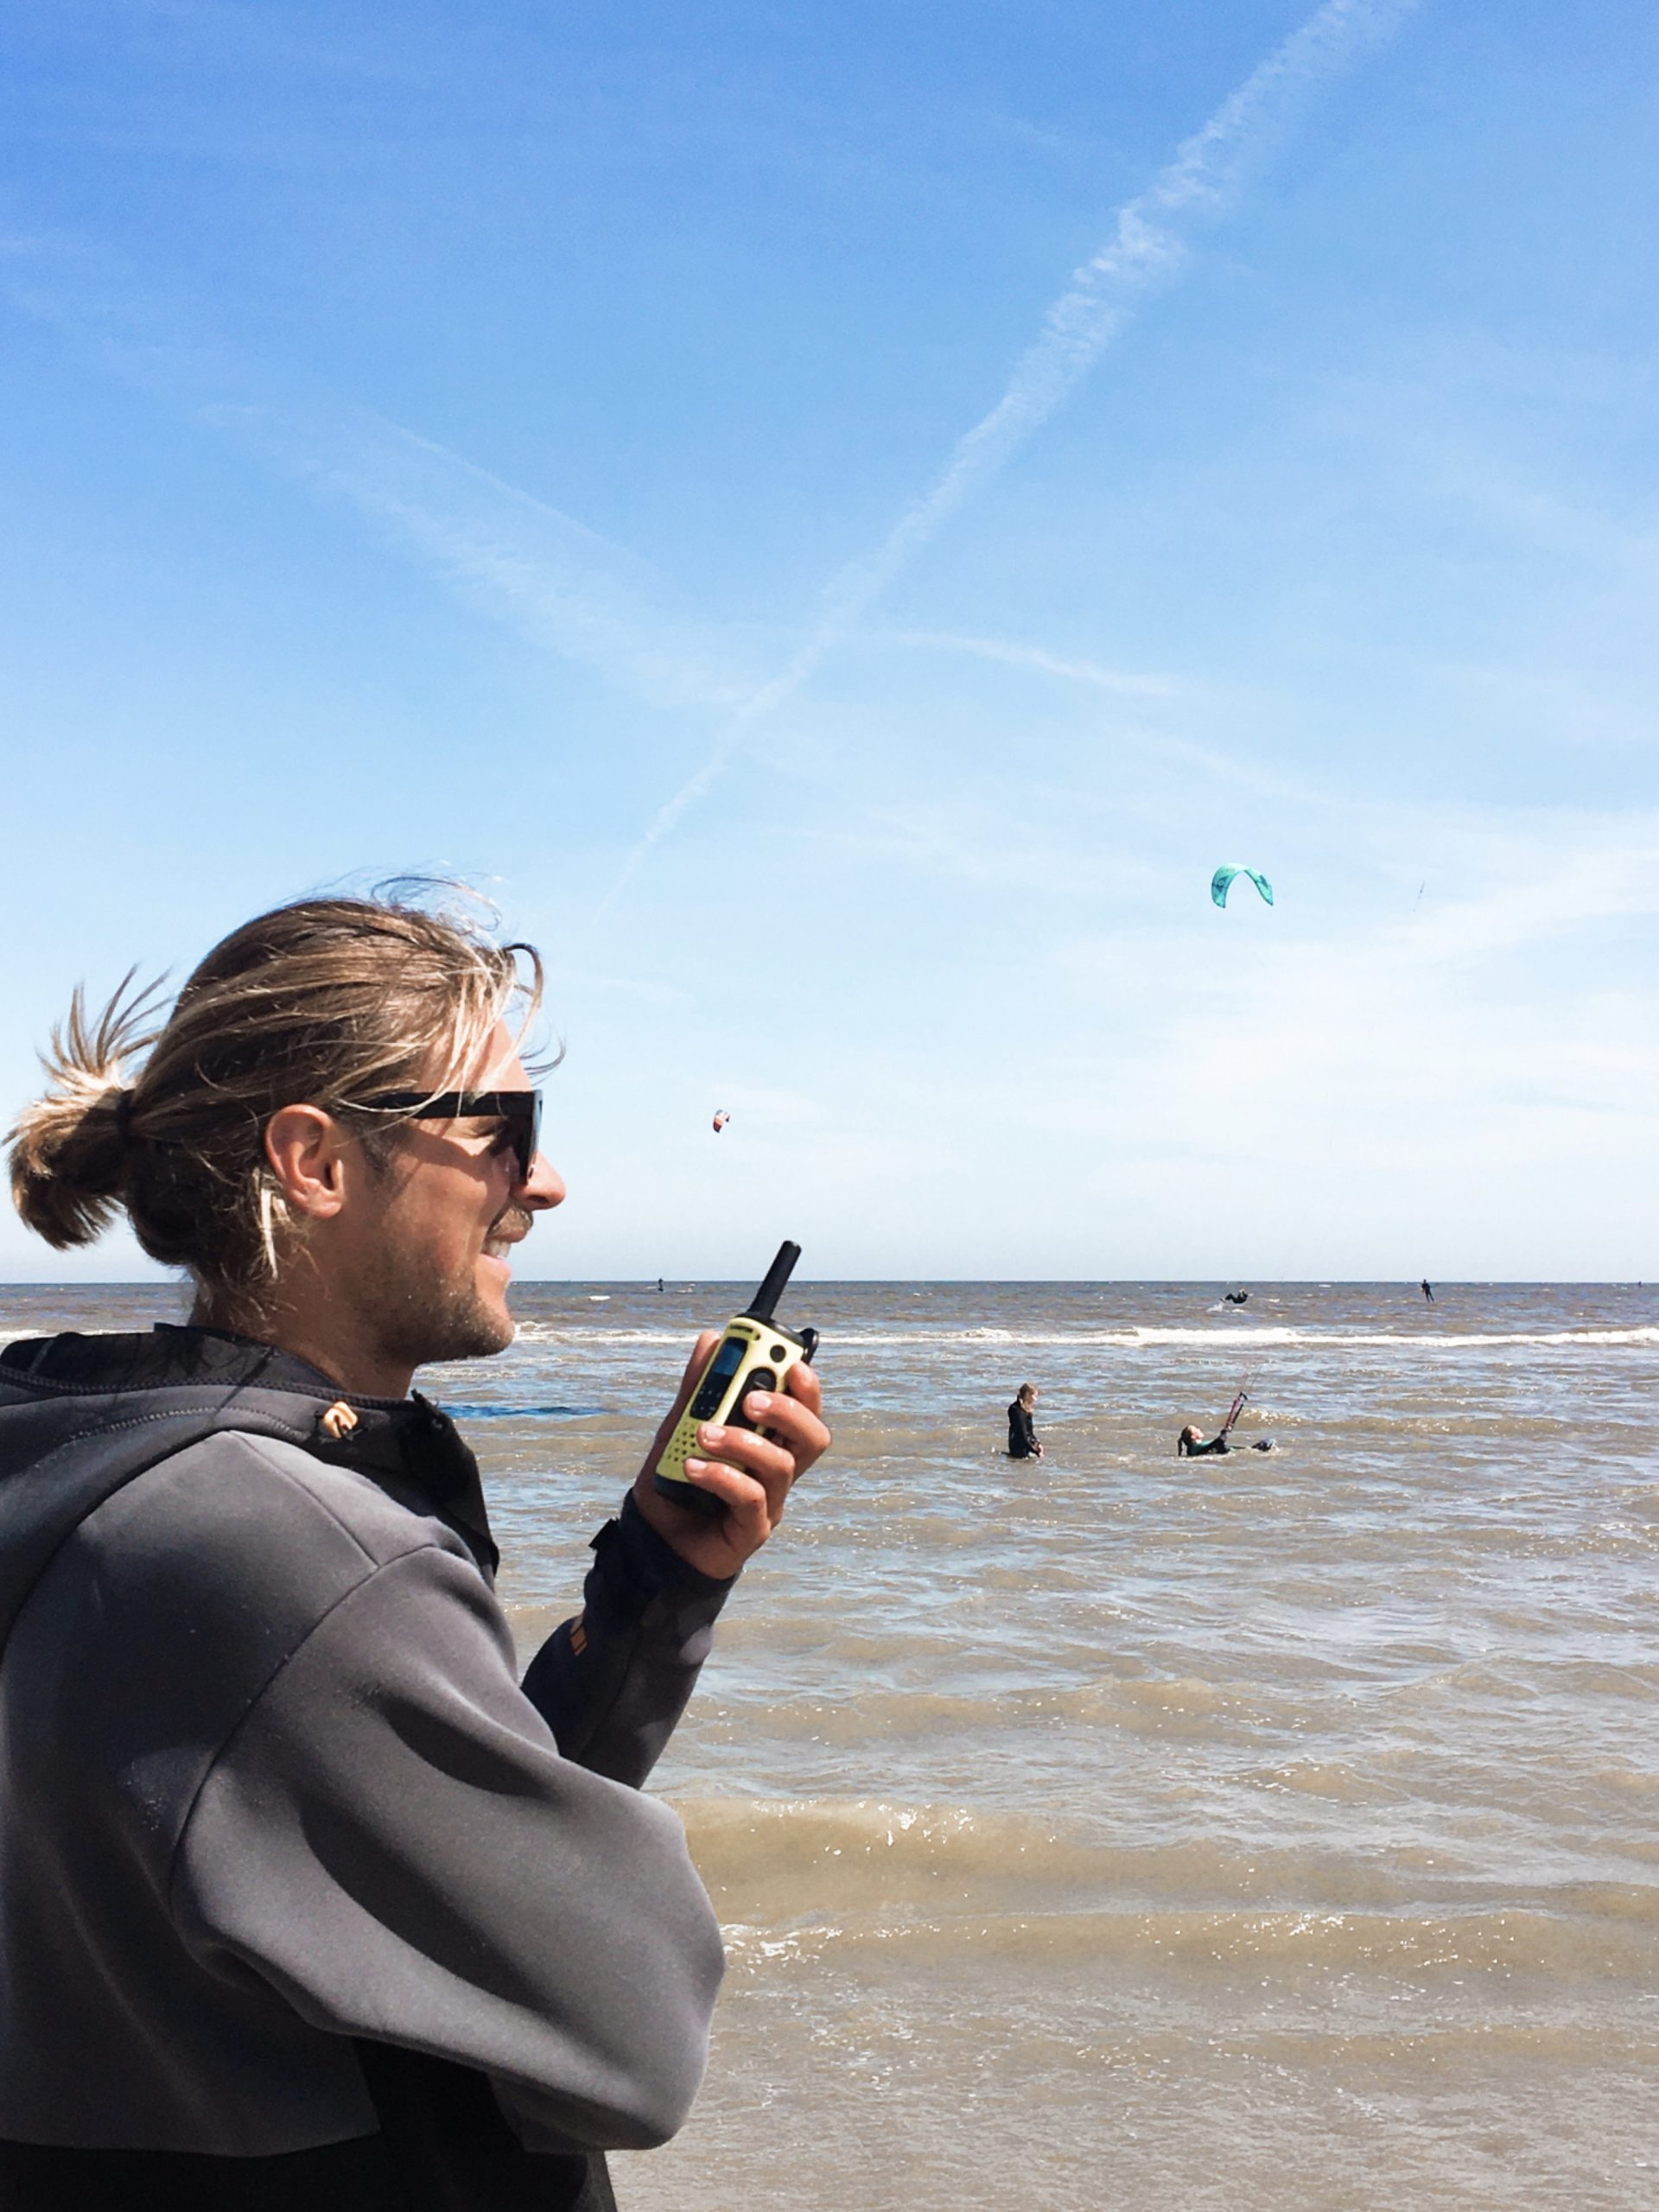 kitesurf cursus bij moana in zandvoort